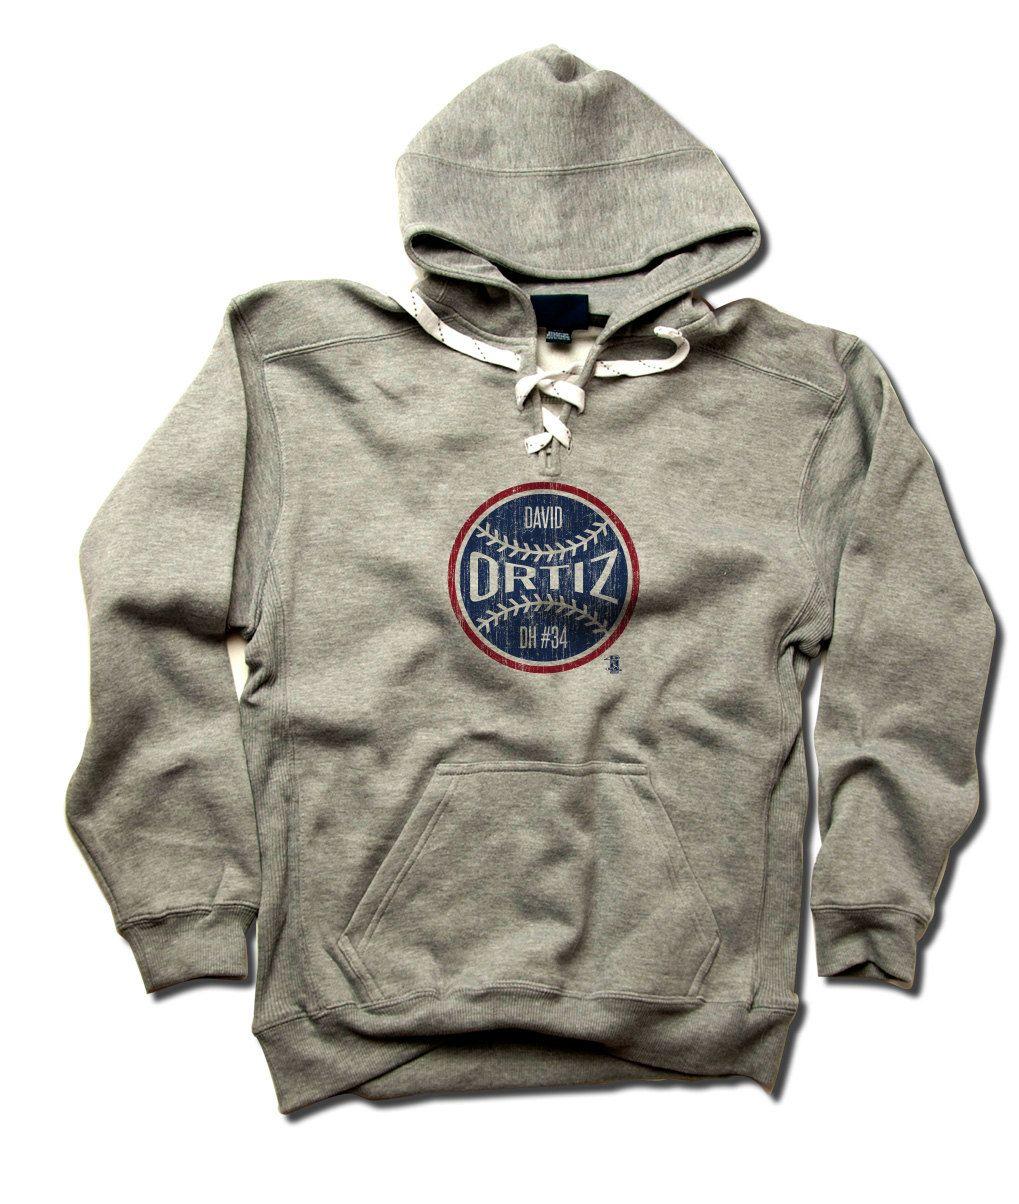 David Ortiz MLBPA Officially Licensed Boston Men's LACE Hoodie S-3XL David Ortiz Ball B